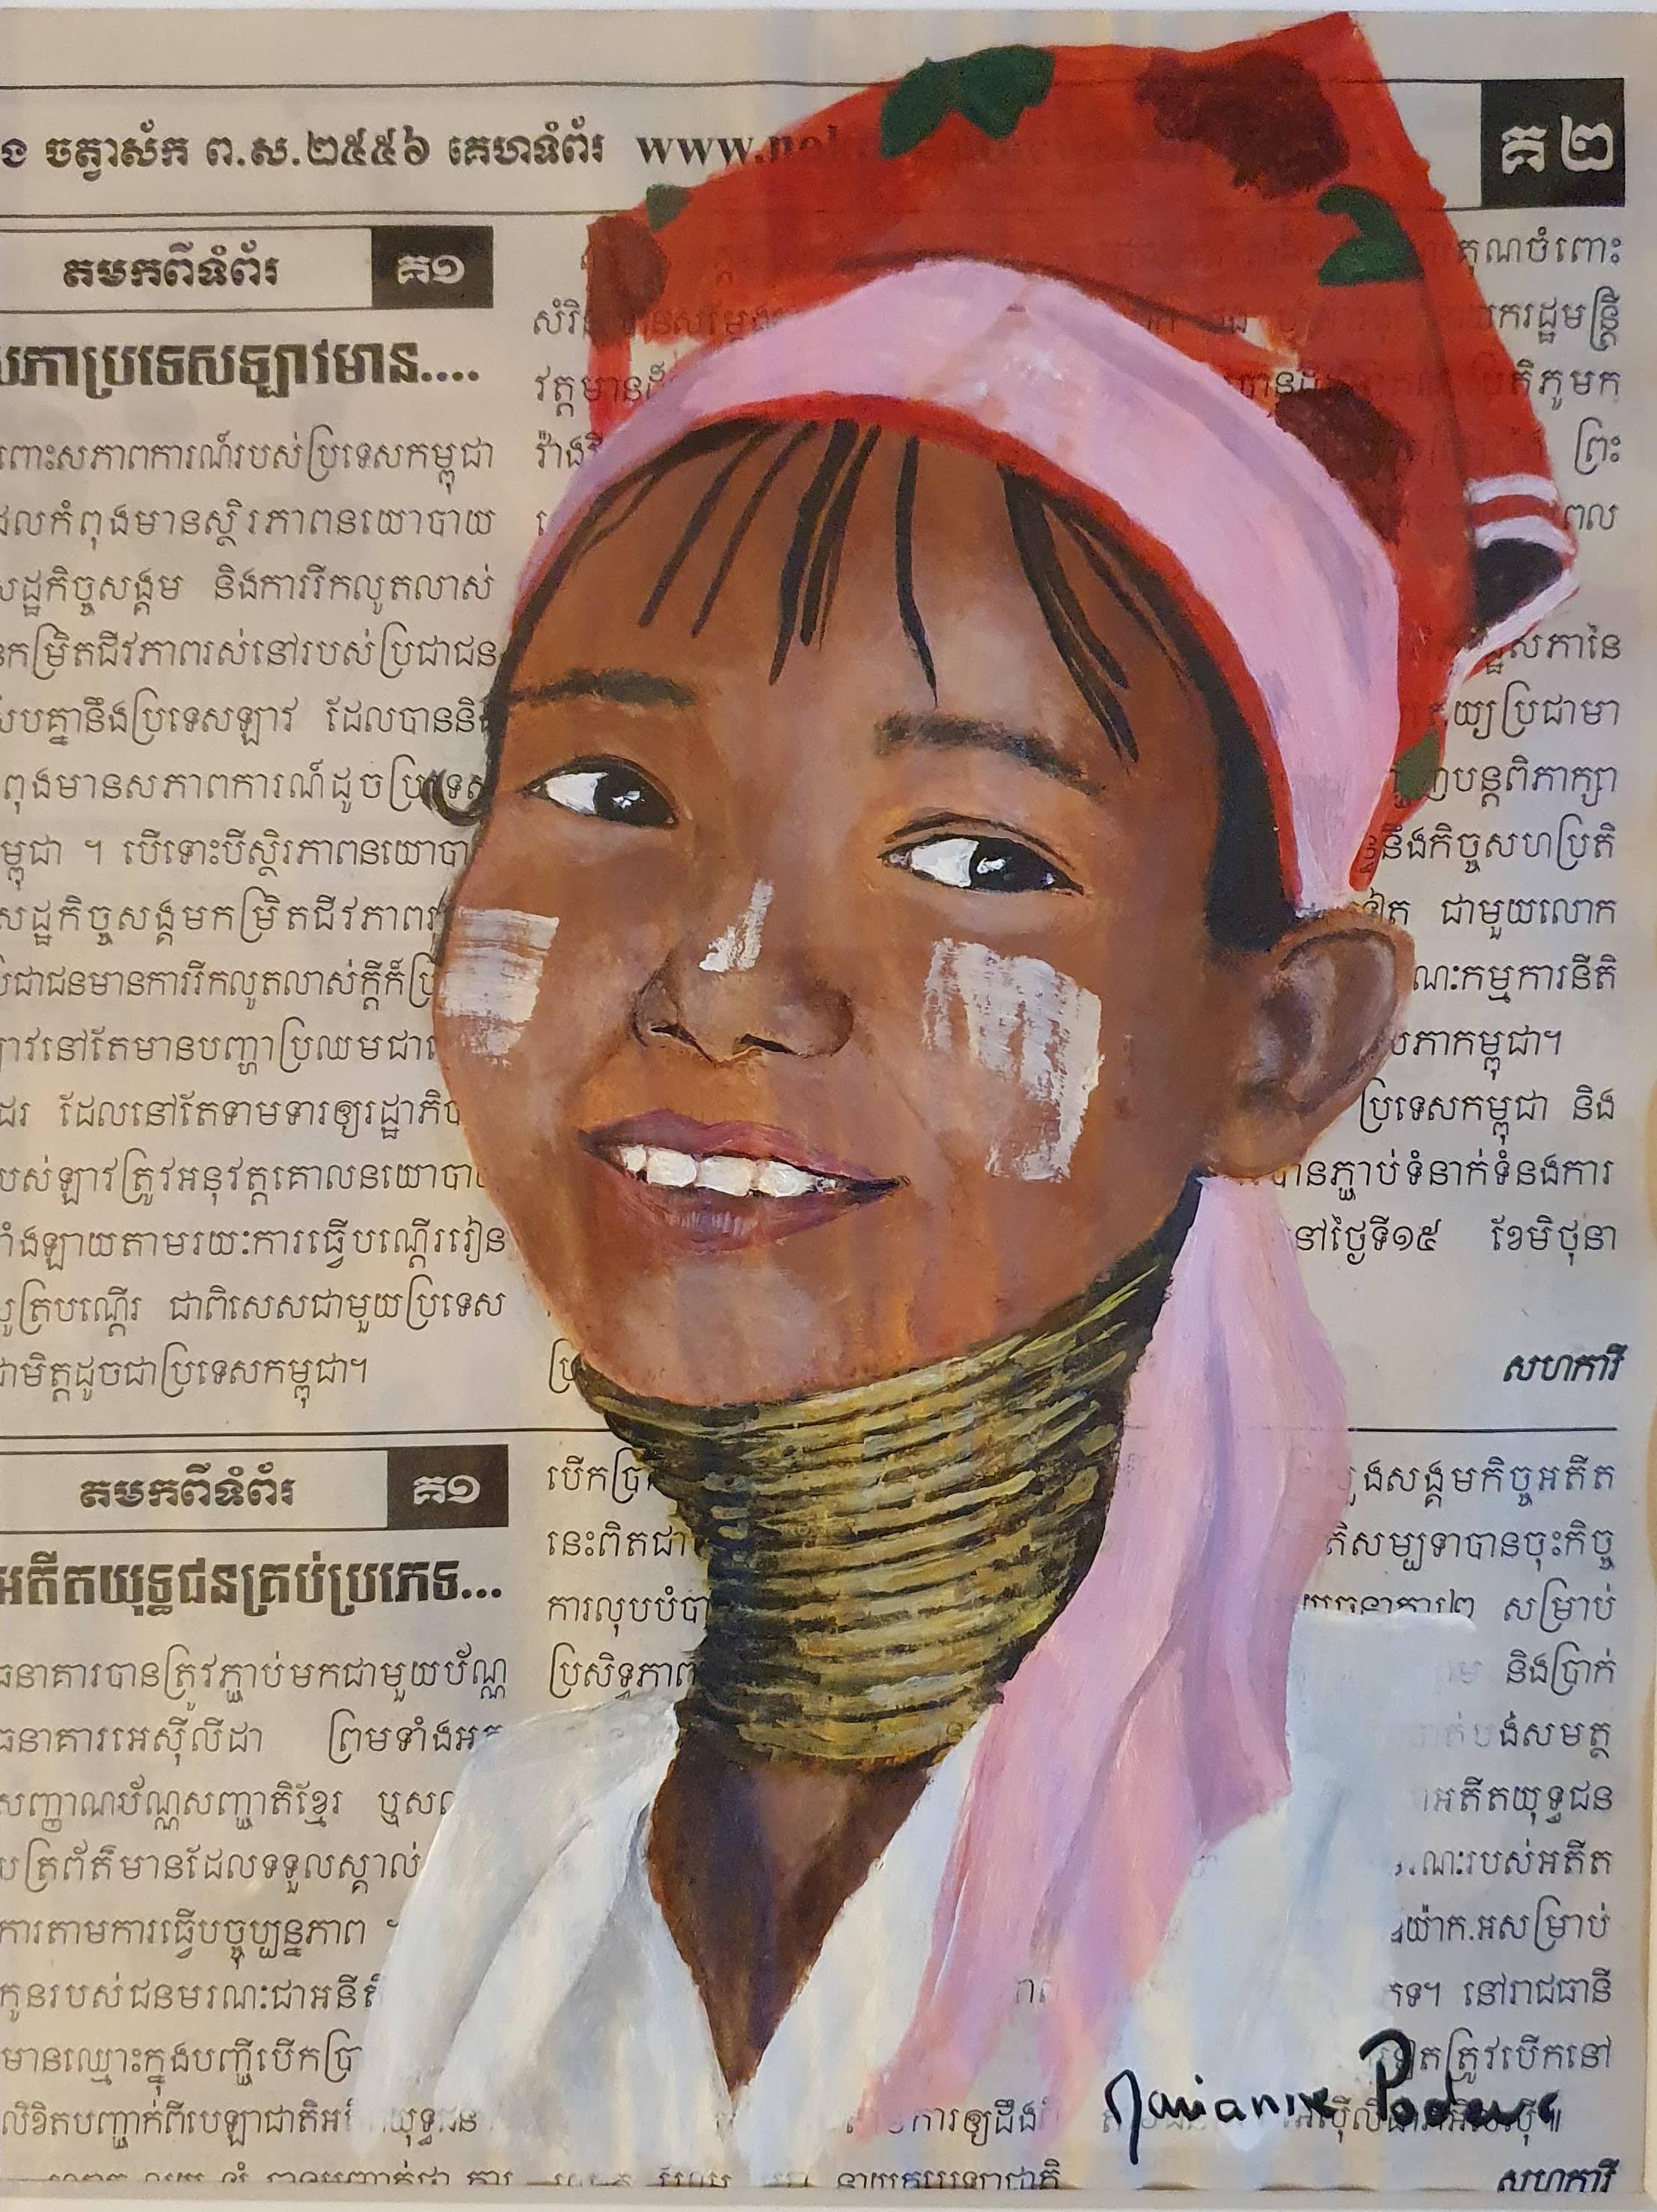 THAILANDE - La fille girafe